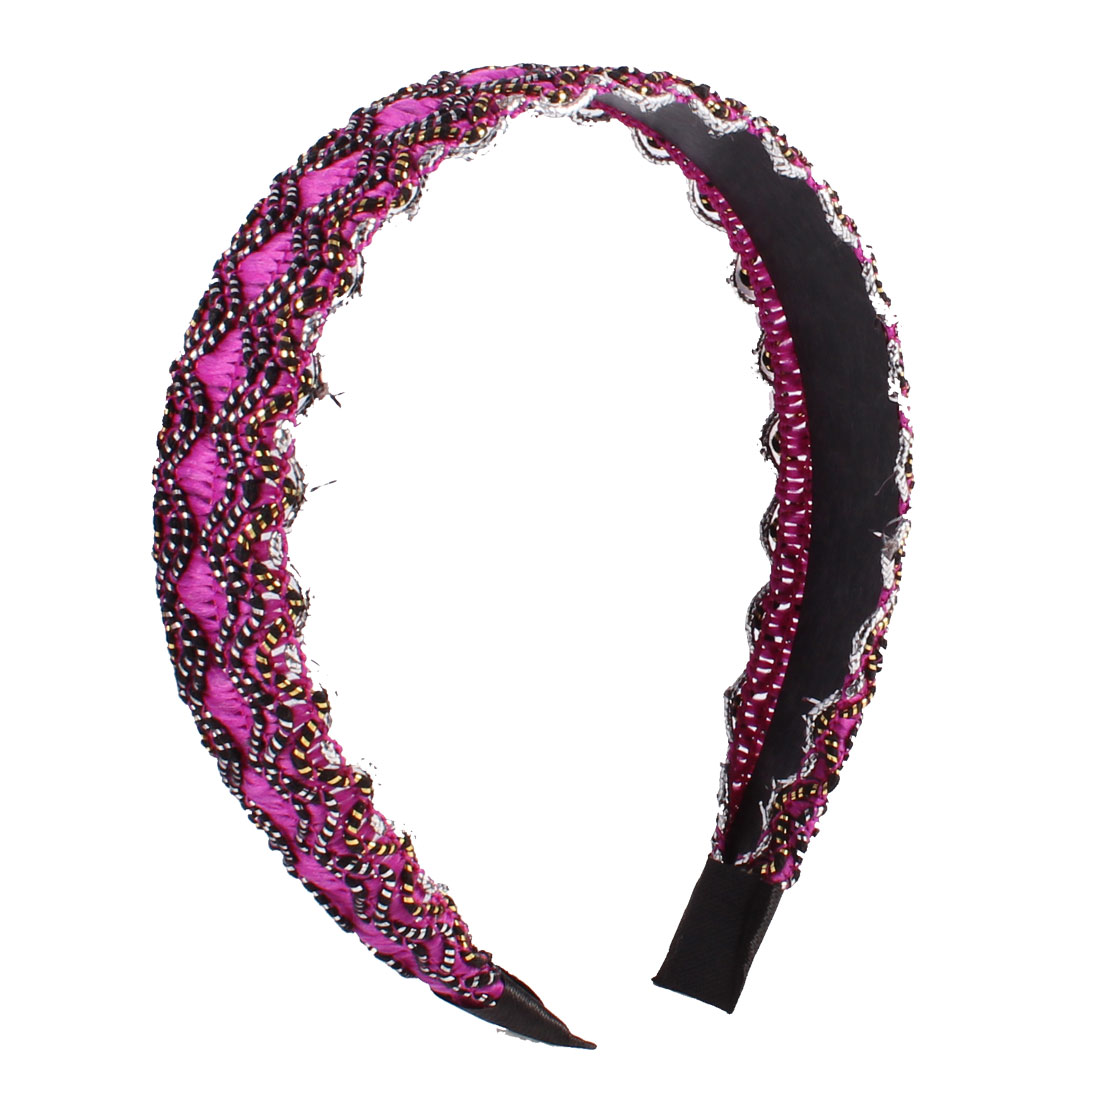 Nylon Rope Covered Wavy Edge Hair Hoop Hairband Fuchsia Black for Woman